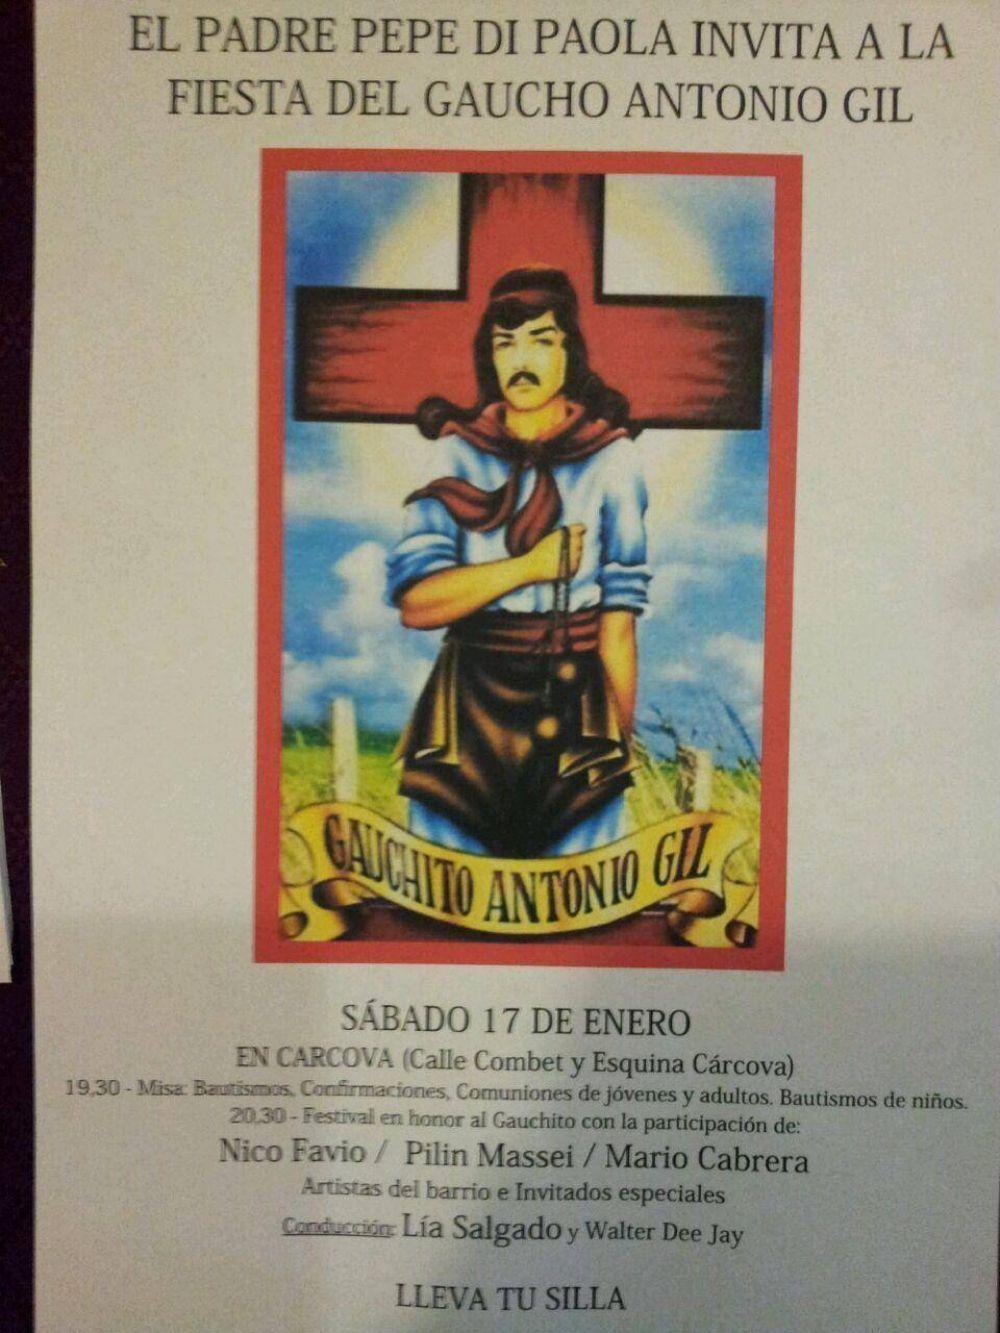 El Padre Pepe Di Paola invita a participar de la fiesta del Gaucho Antonio Gil